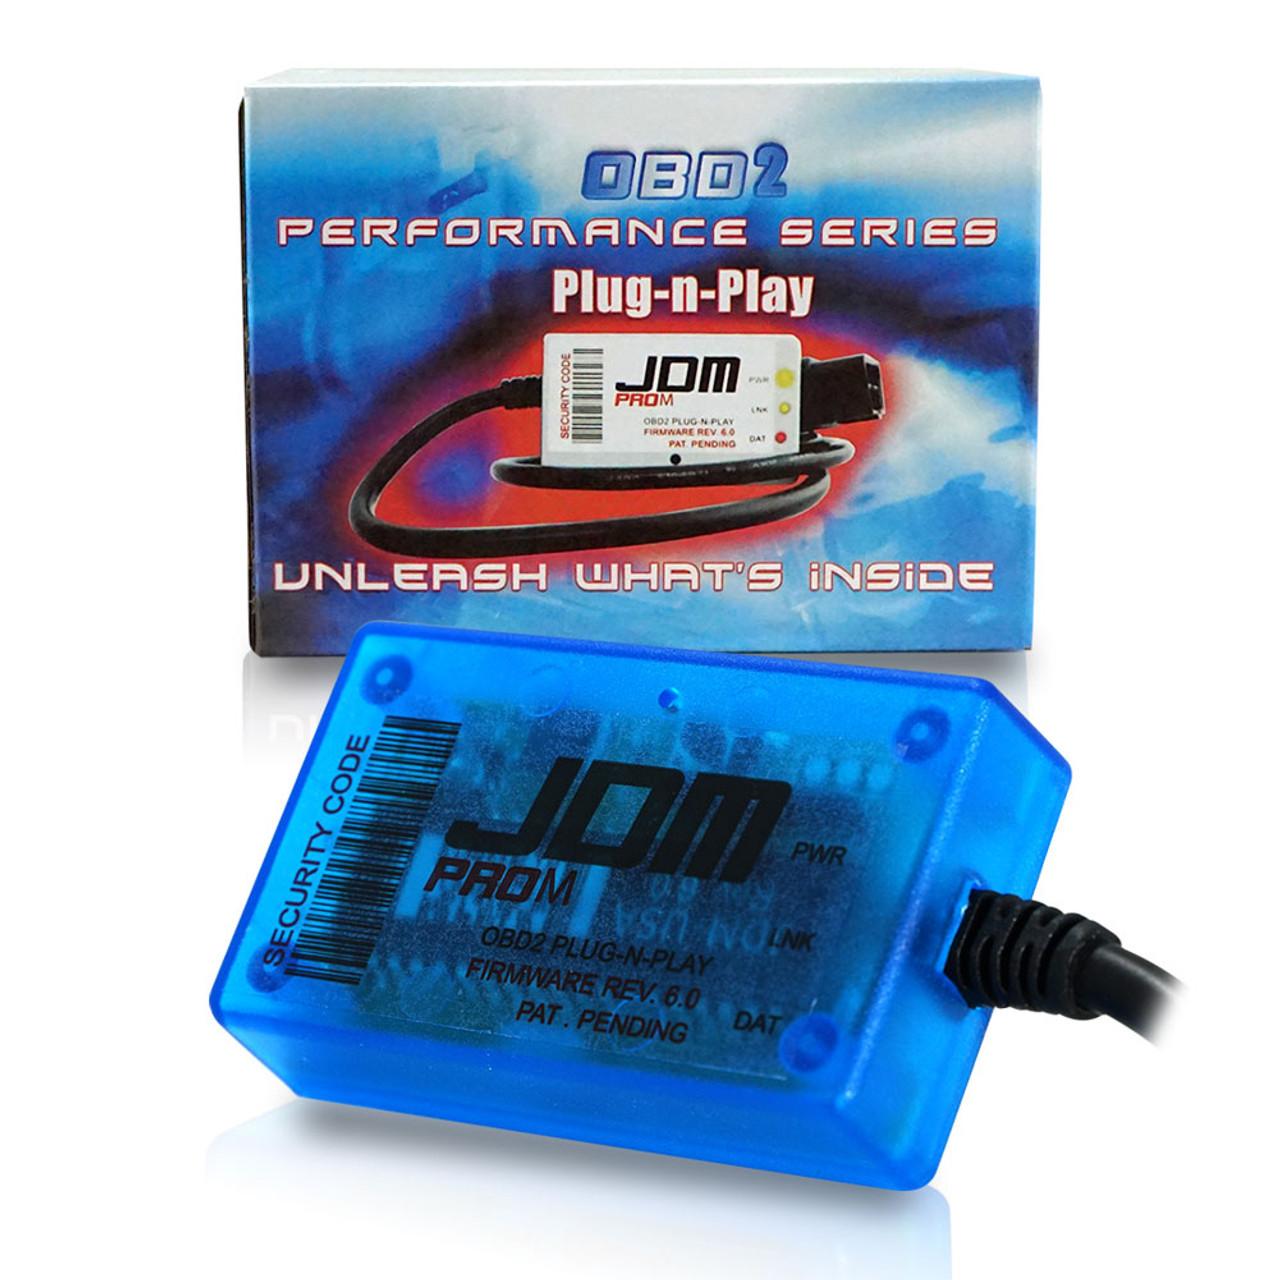 Chiptuning ChipPower OBD2 v3 f/ür M-Klasse ML280//300 CDI W164 Chip Tuning Diesel